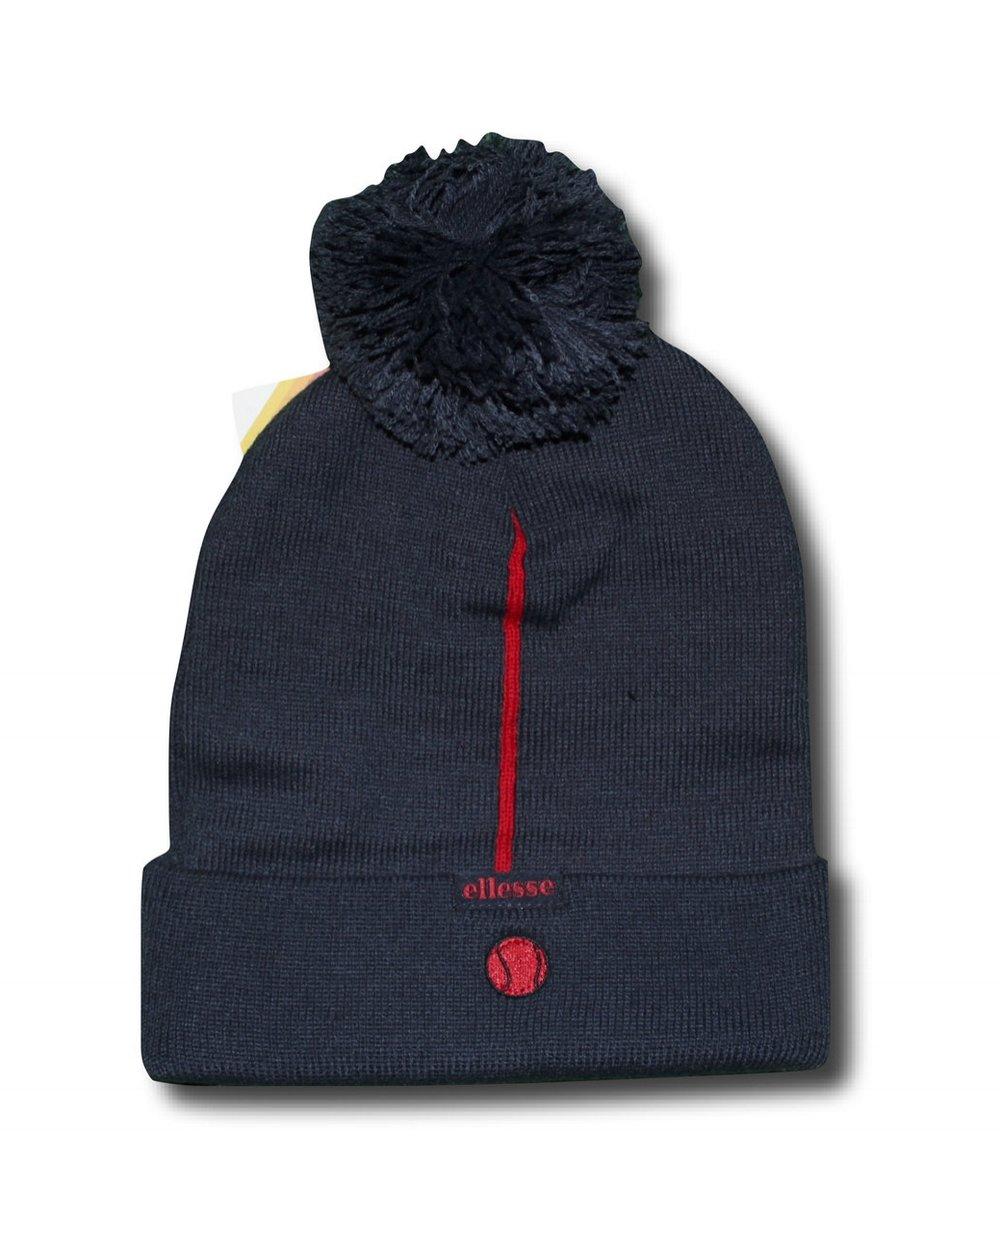 aeac3916560 Ellesse Penguin x 80s Casuals Navy  Alvy  Bobble Hat — 80s Casuals